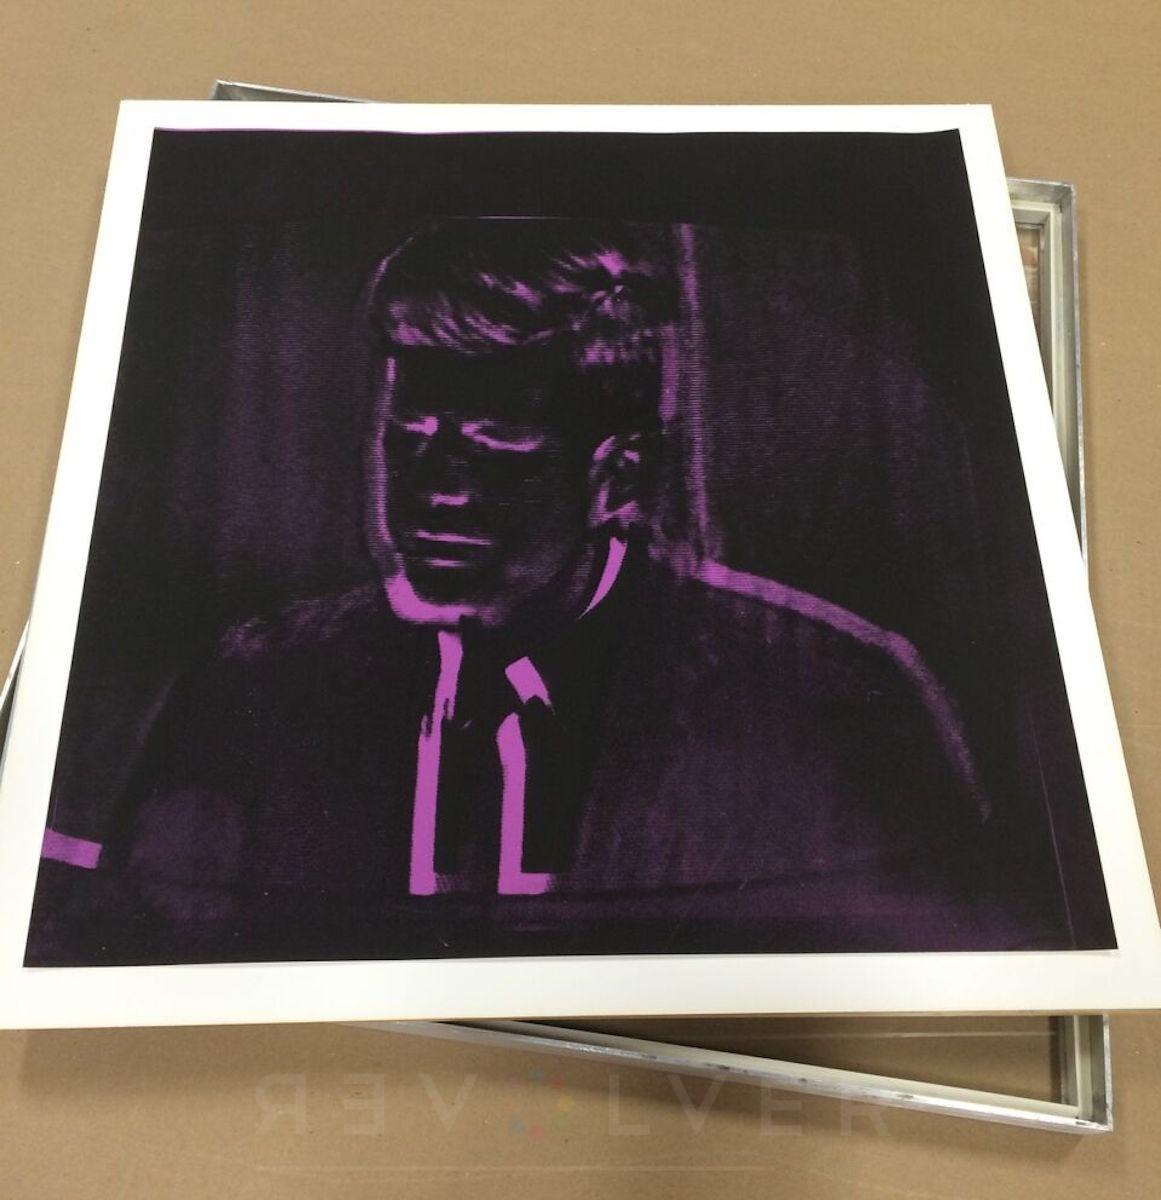 Andy Warhol - Flash F.S. II 41 jpg